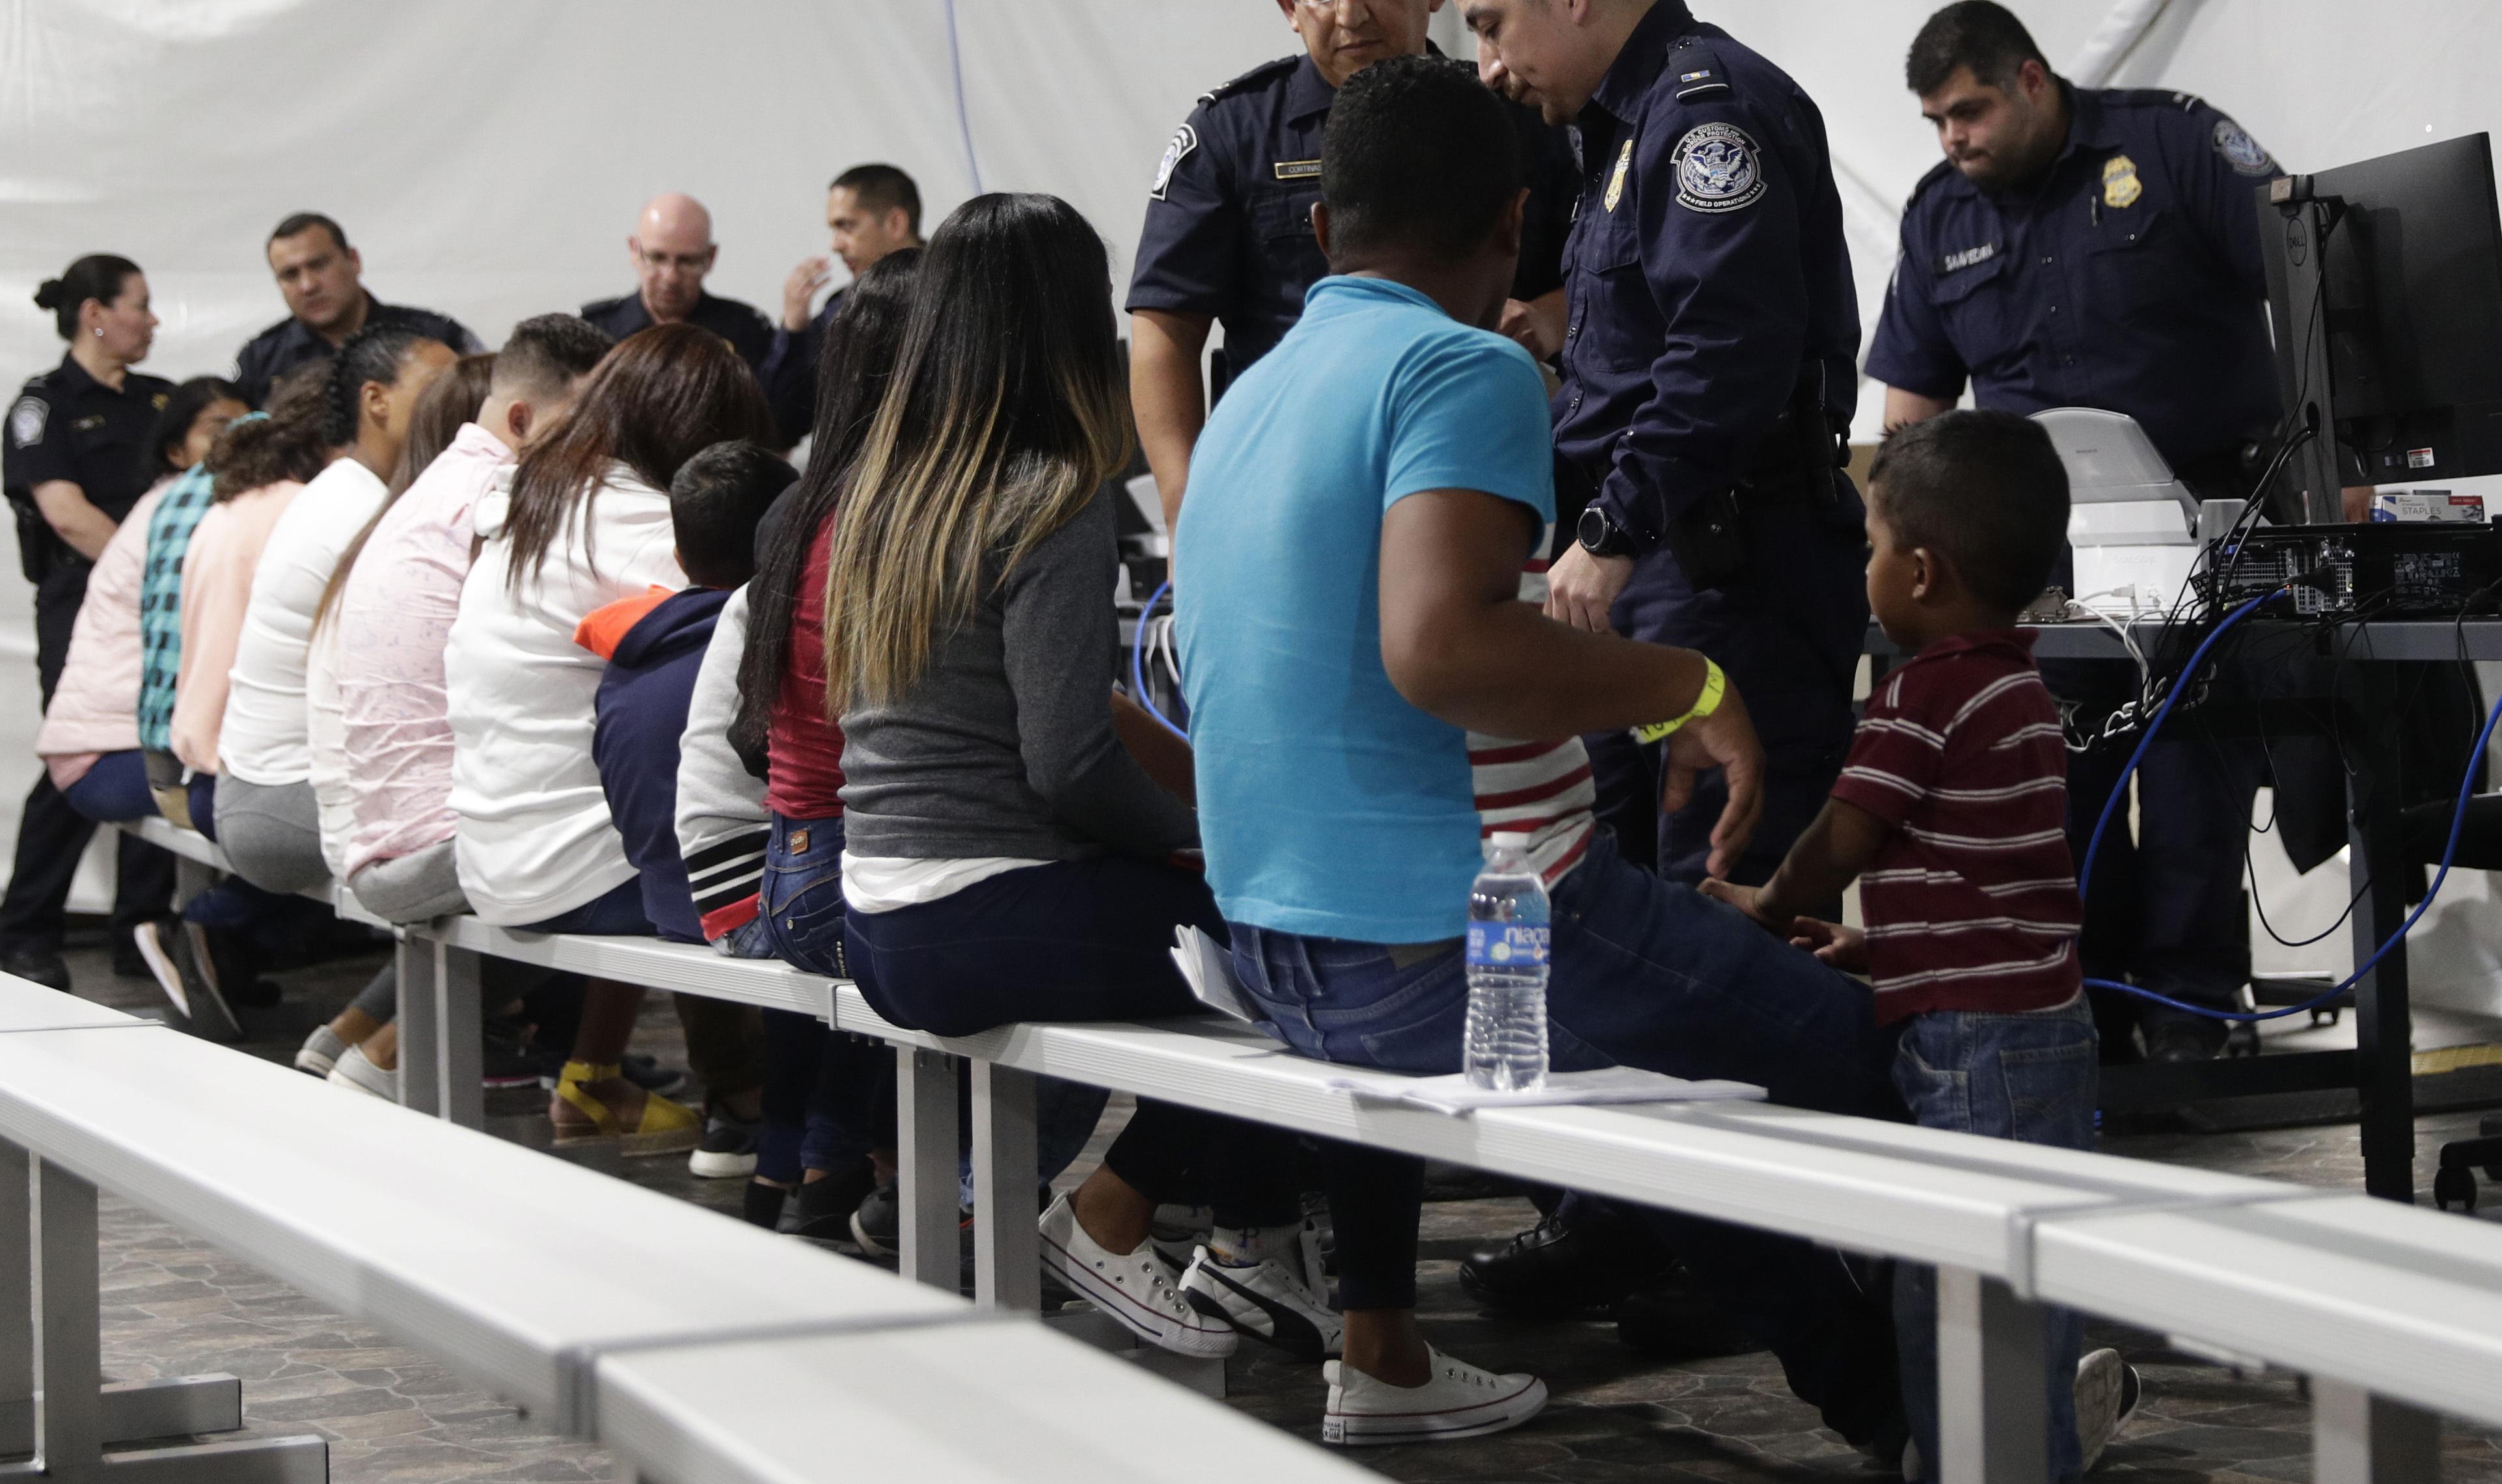 US starts sending asylum seekers across Arizona border